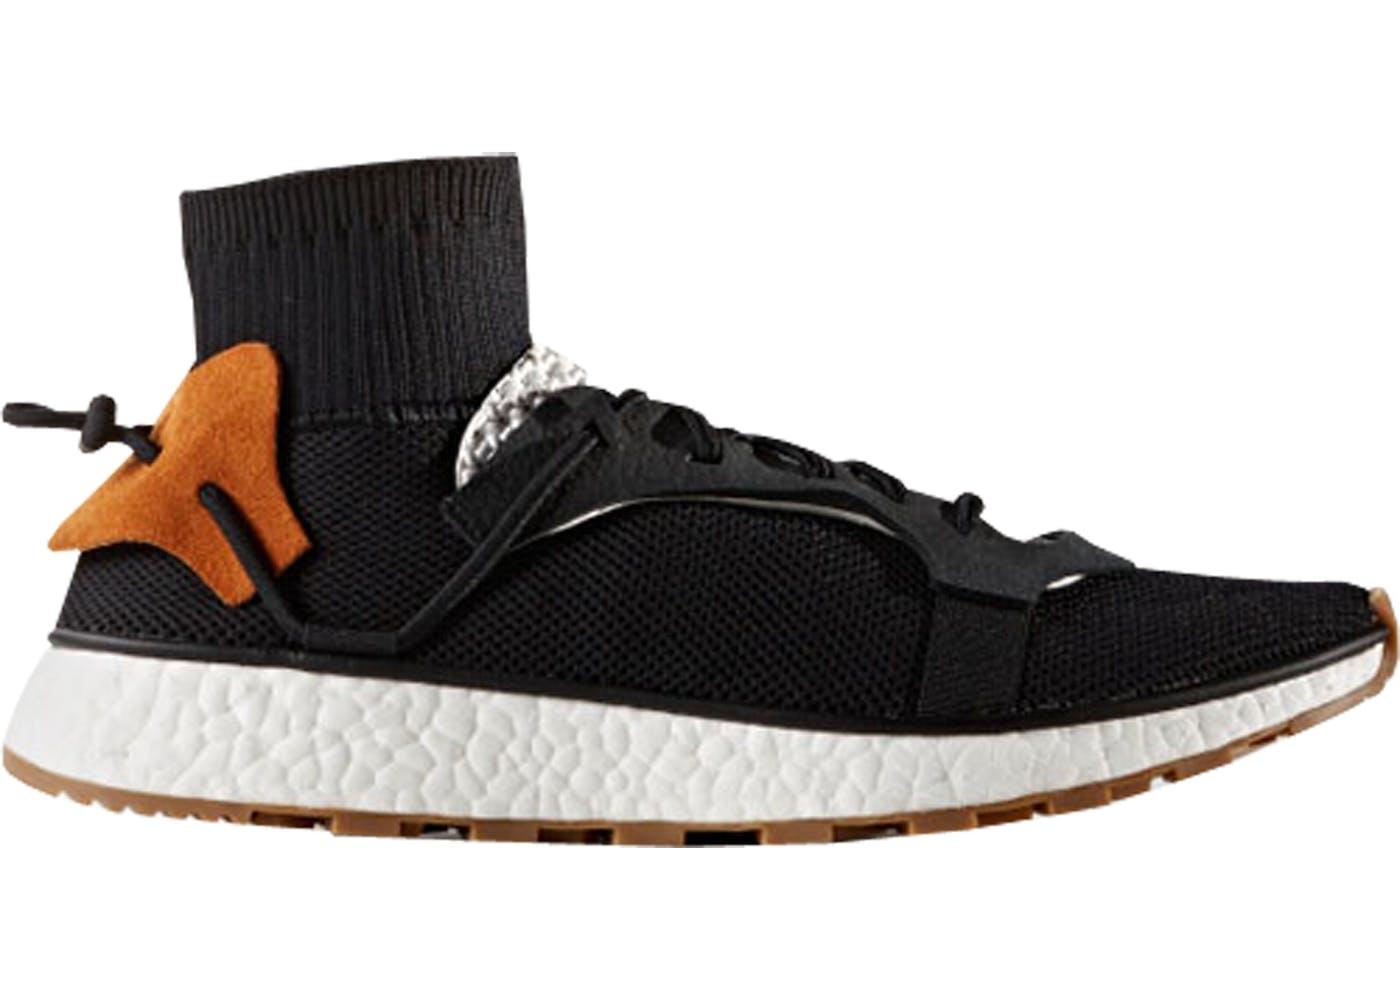 adidas aw run alexander wang black. Black Bedroom Furniture Sets. Home Design Ideas